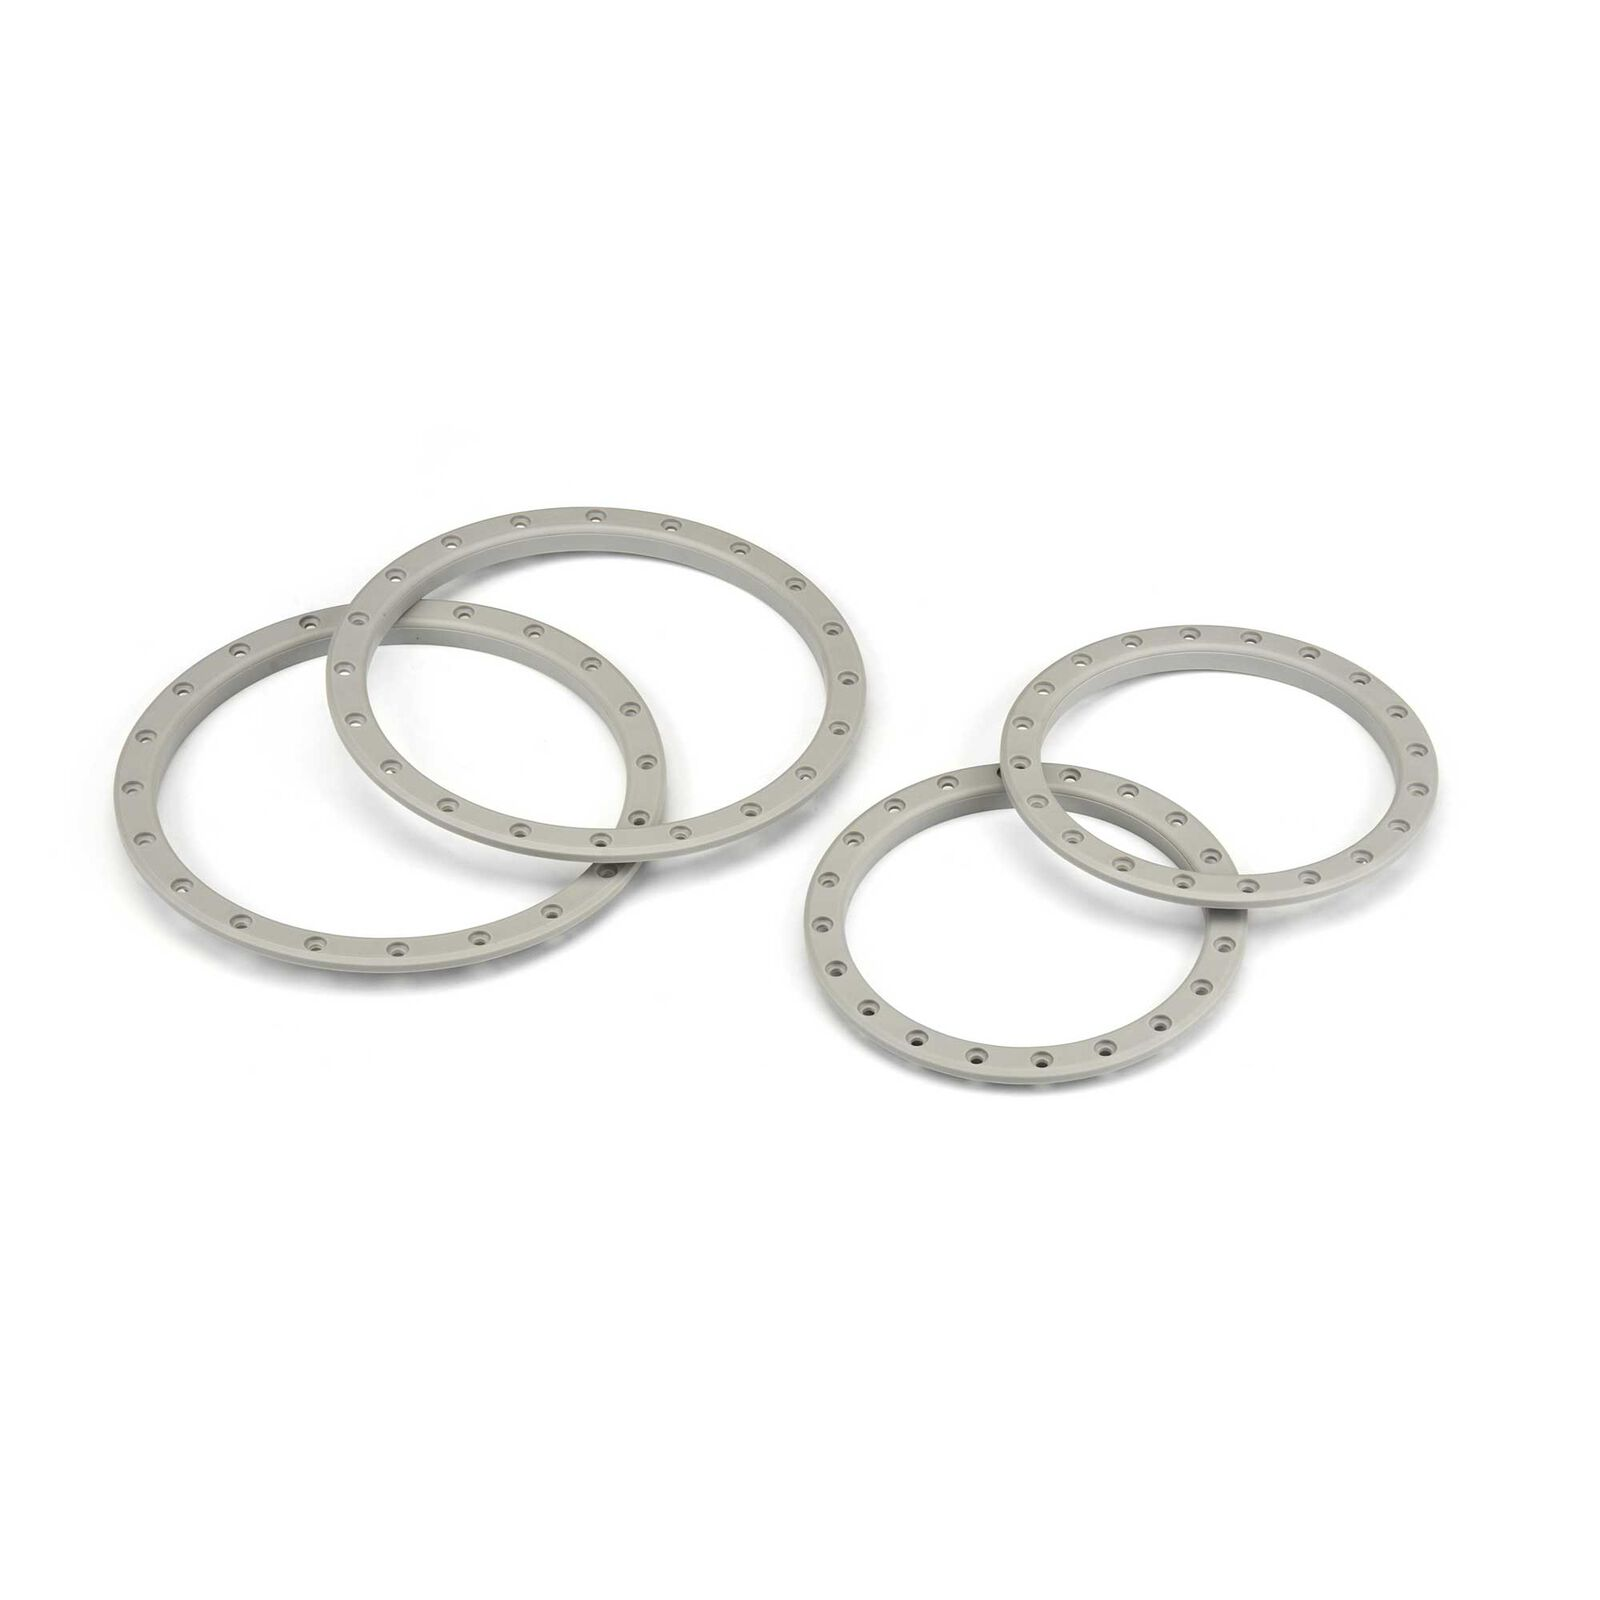 1/5 Impulse Pro-Loc Replacement Rings (2) Stone Gray